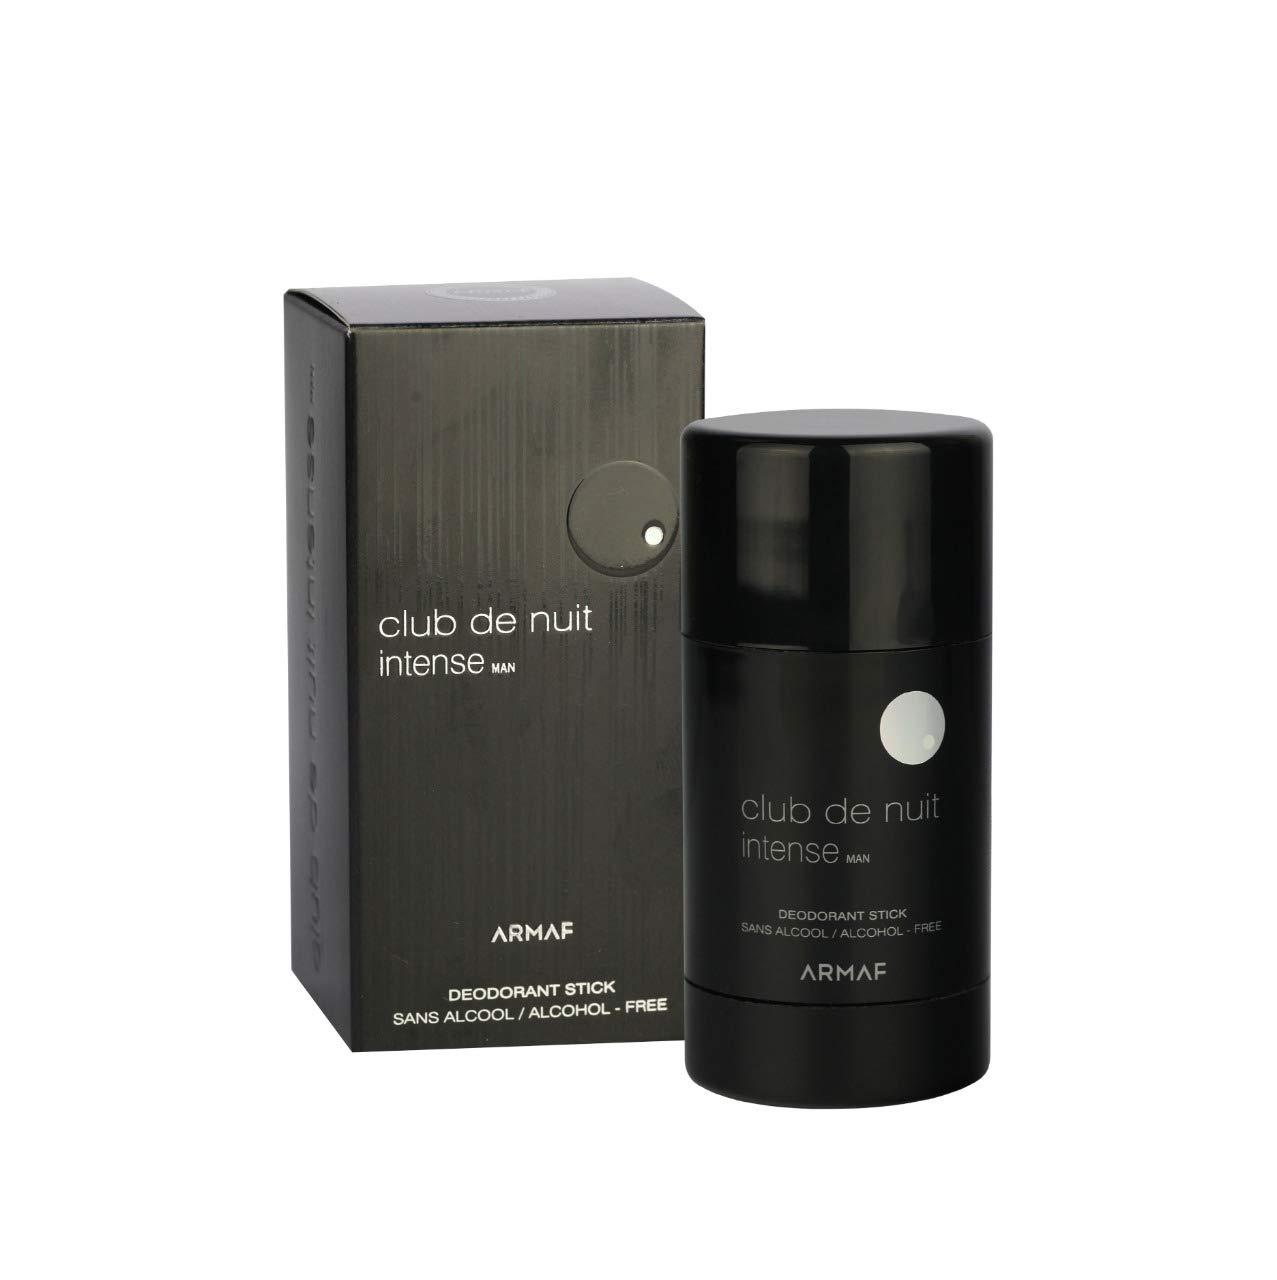 2 Japan Maker New Pack of Armaf Club De Nuit Deodorant Men oz Price reduction 2.65 Intense Stick